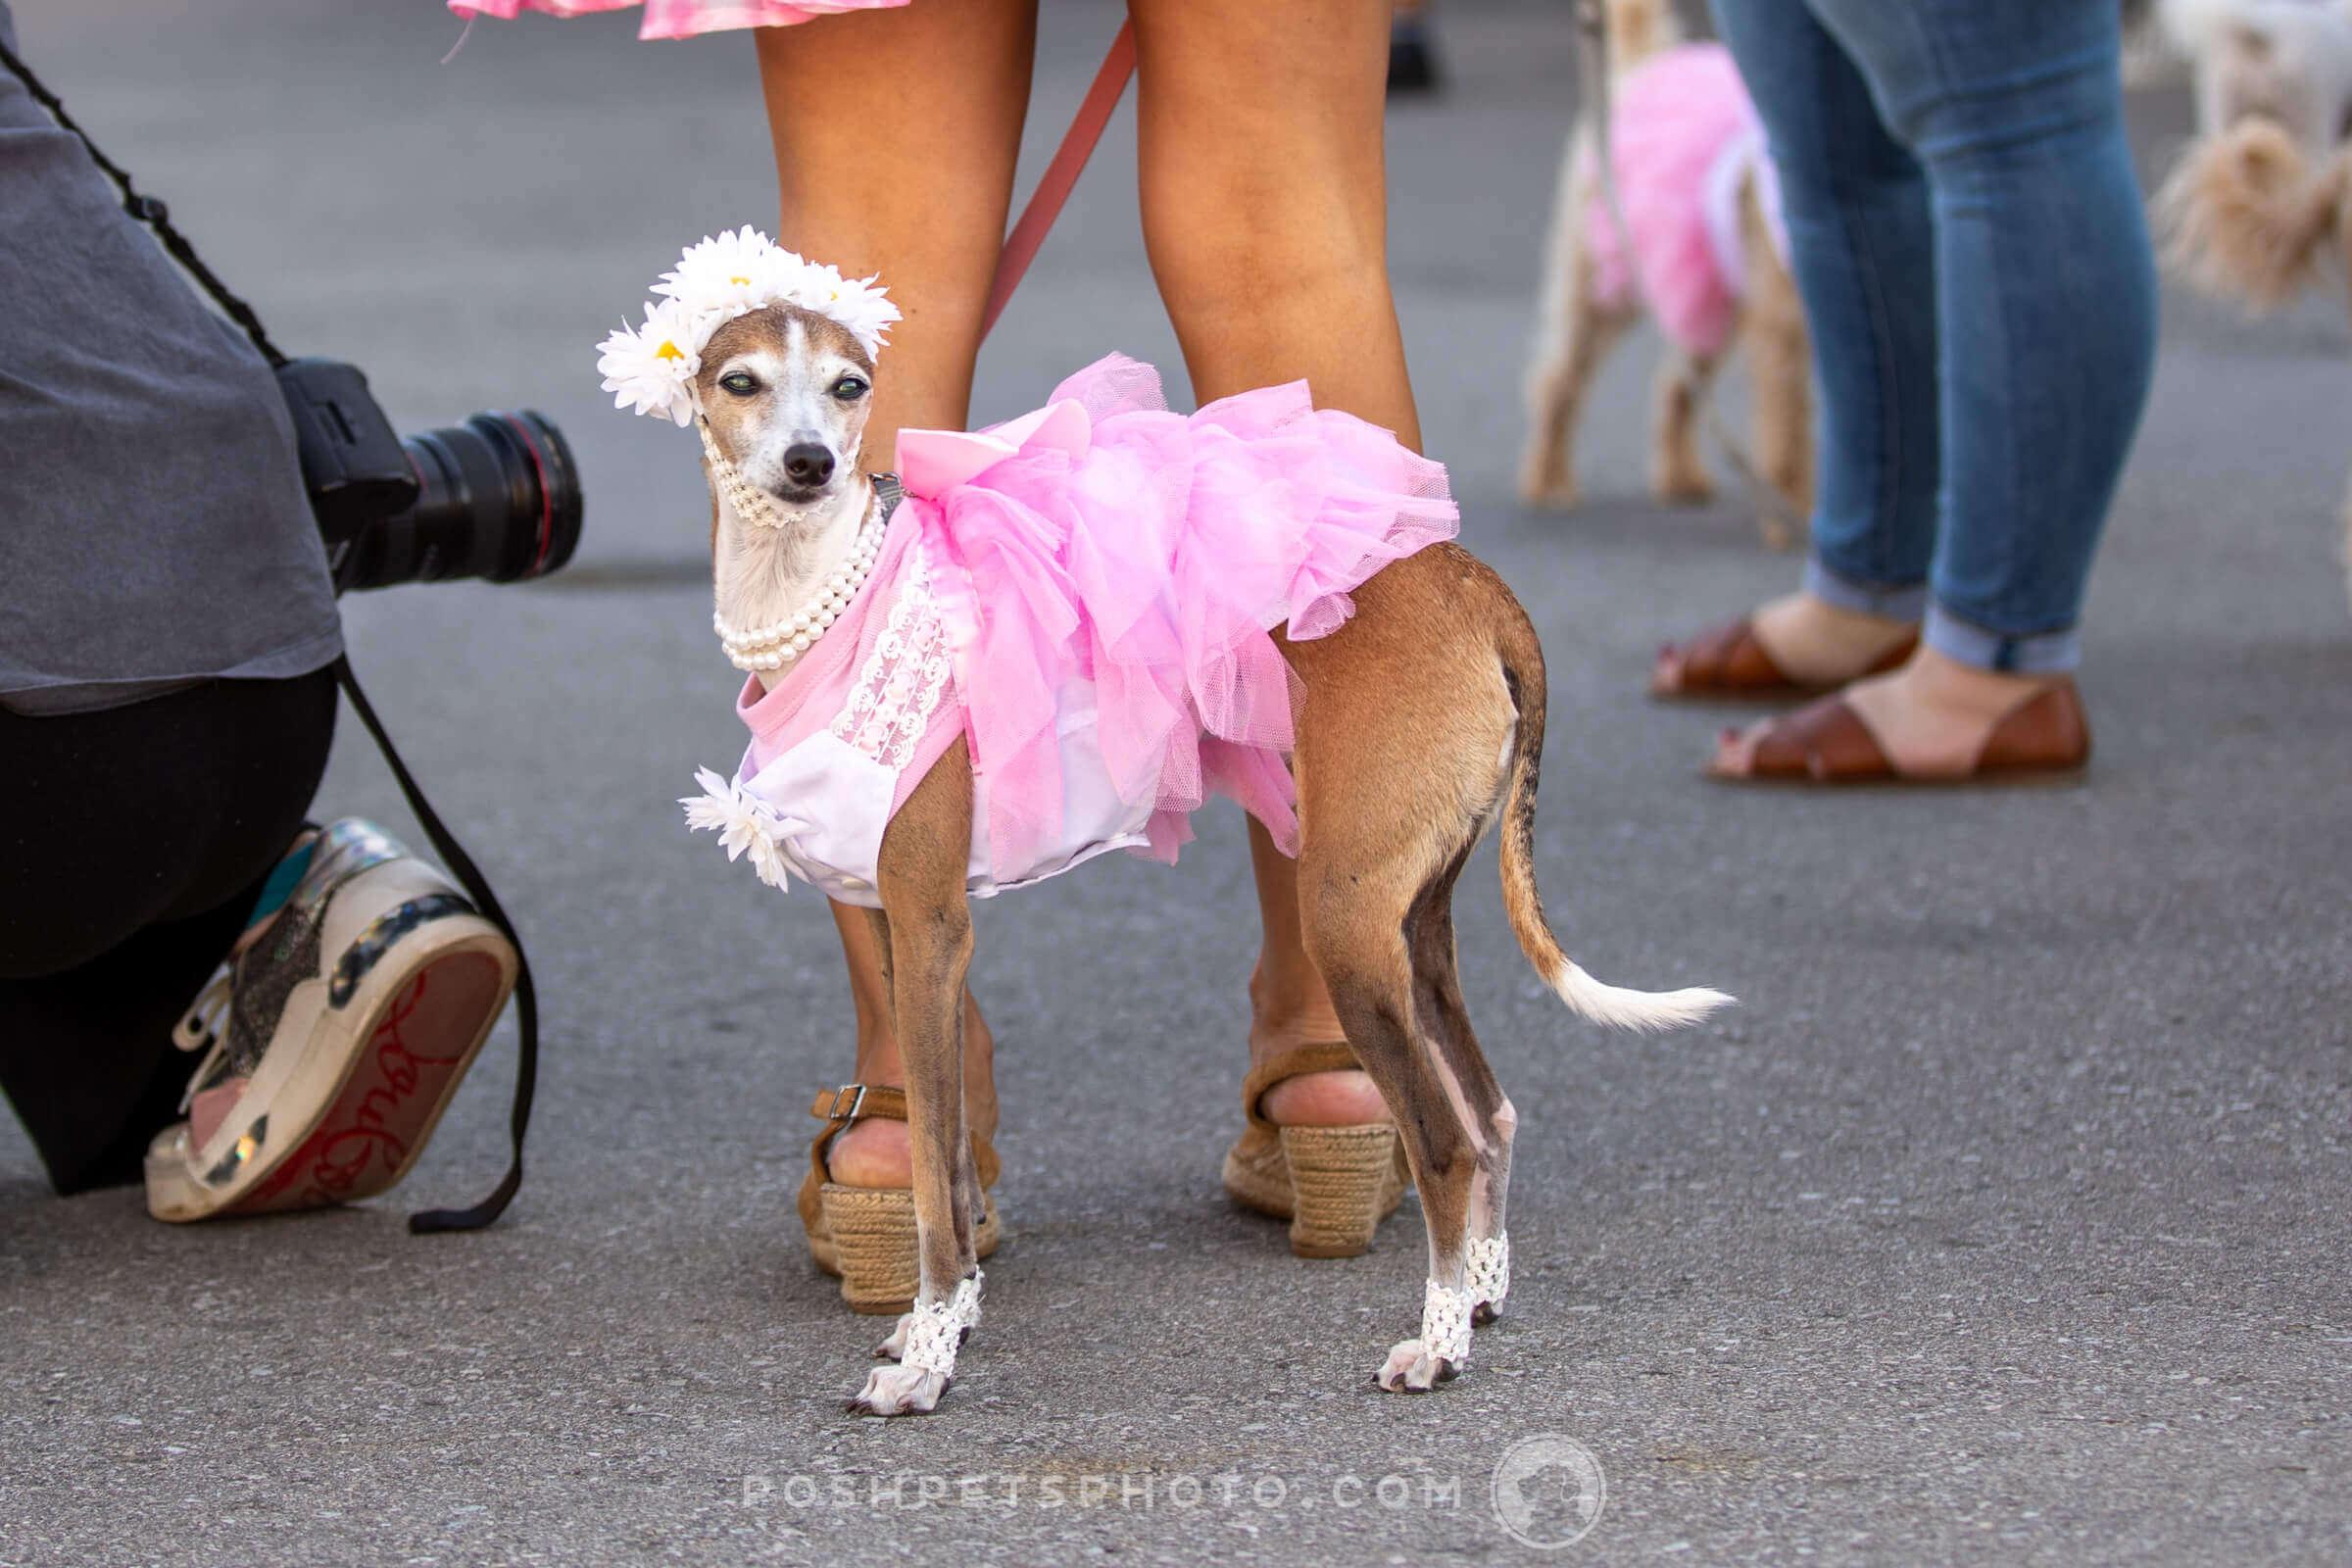 posh-pets-photography-19